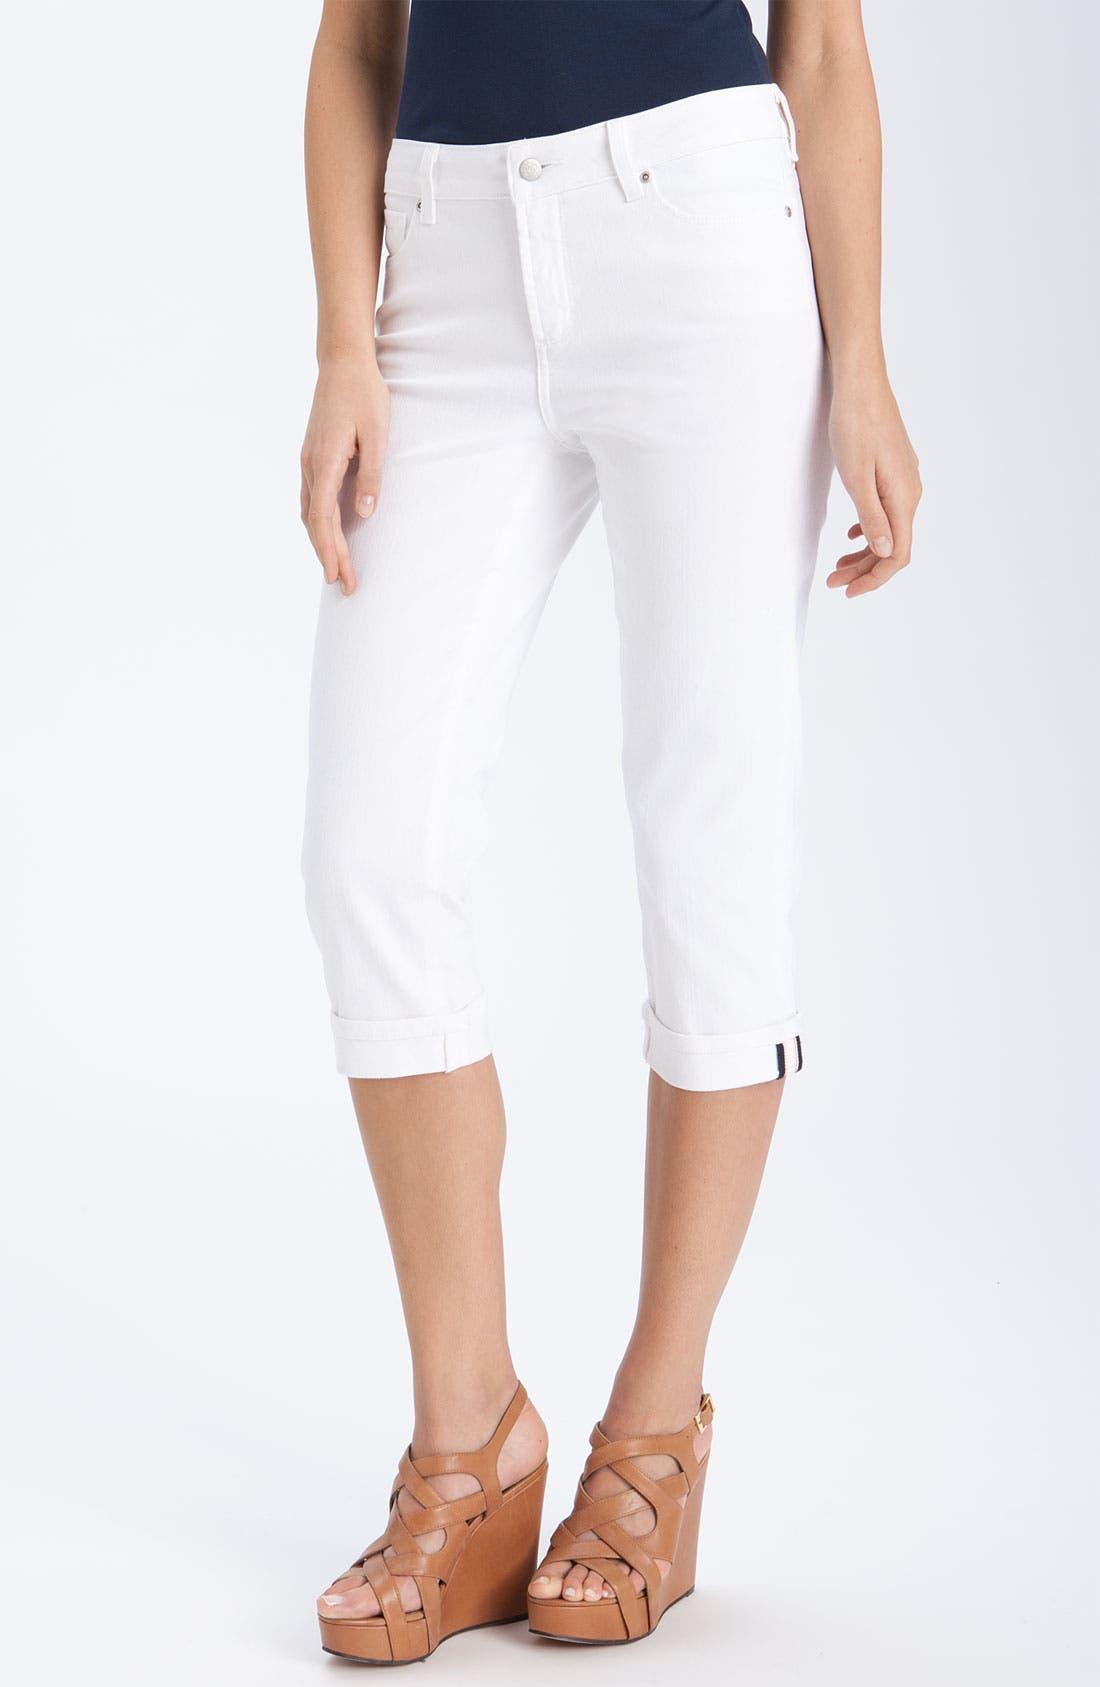 Alternate Image 1 Selected - NYDJ 'Edna' Crop Stretch Jeans